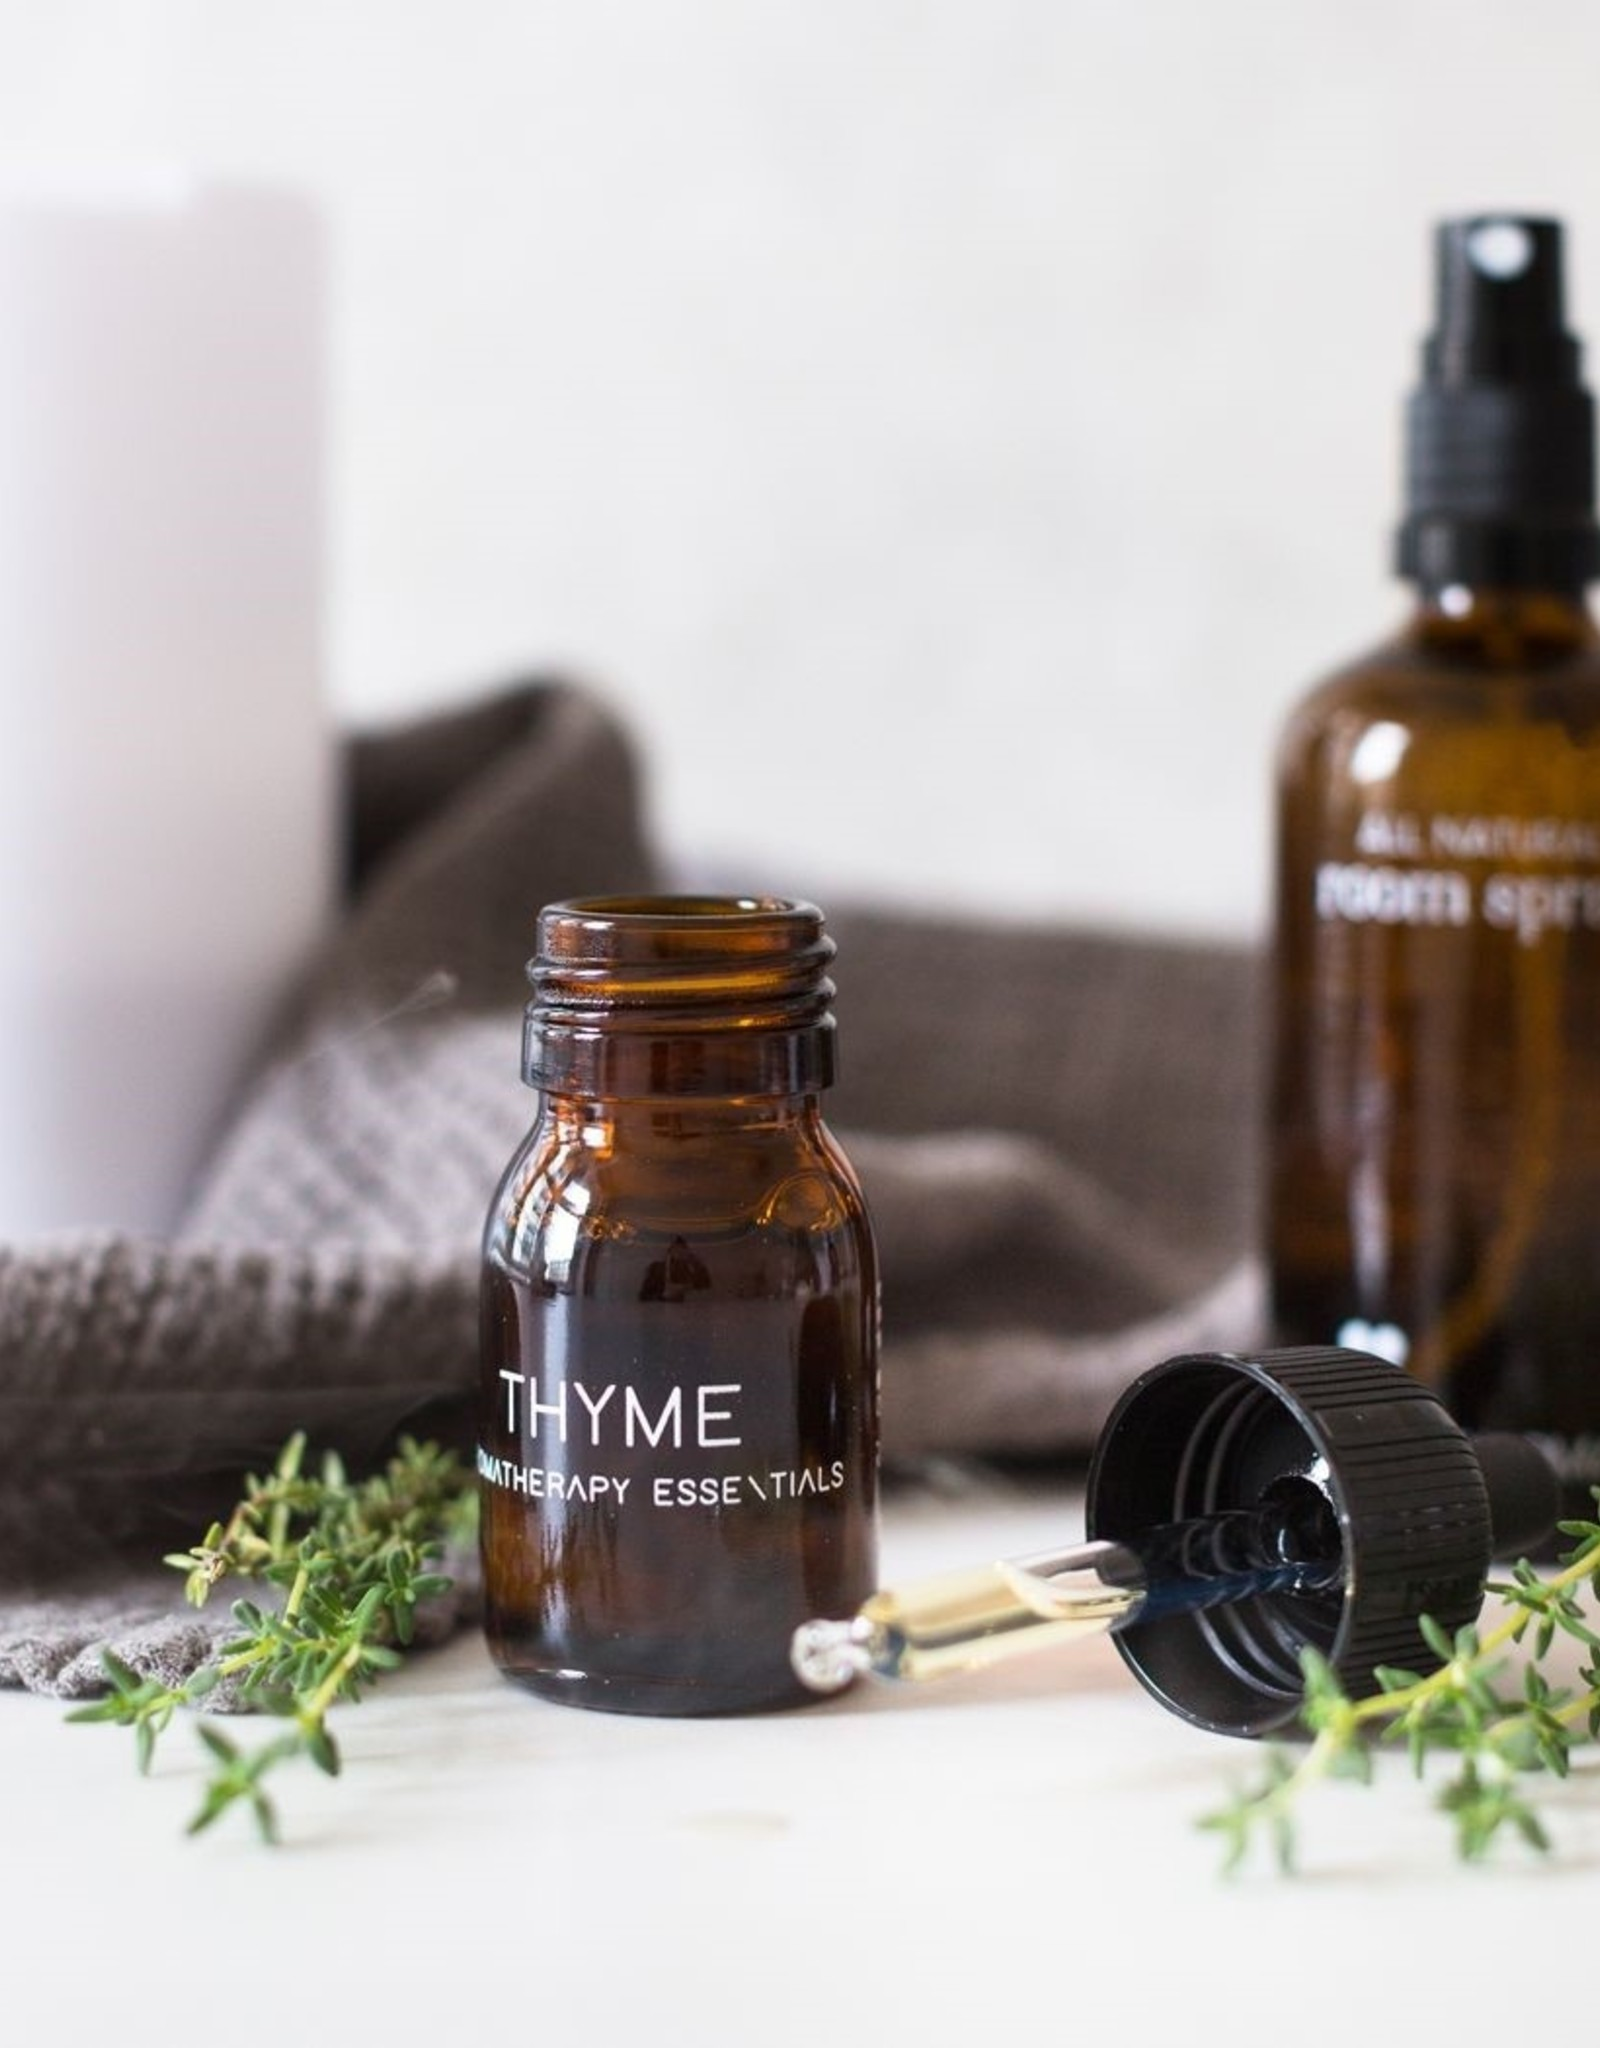 RainPharma Rainpharma - Essential Oil Thyme 30ml